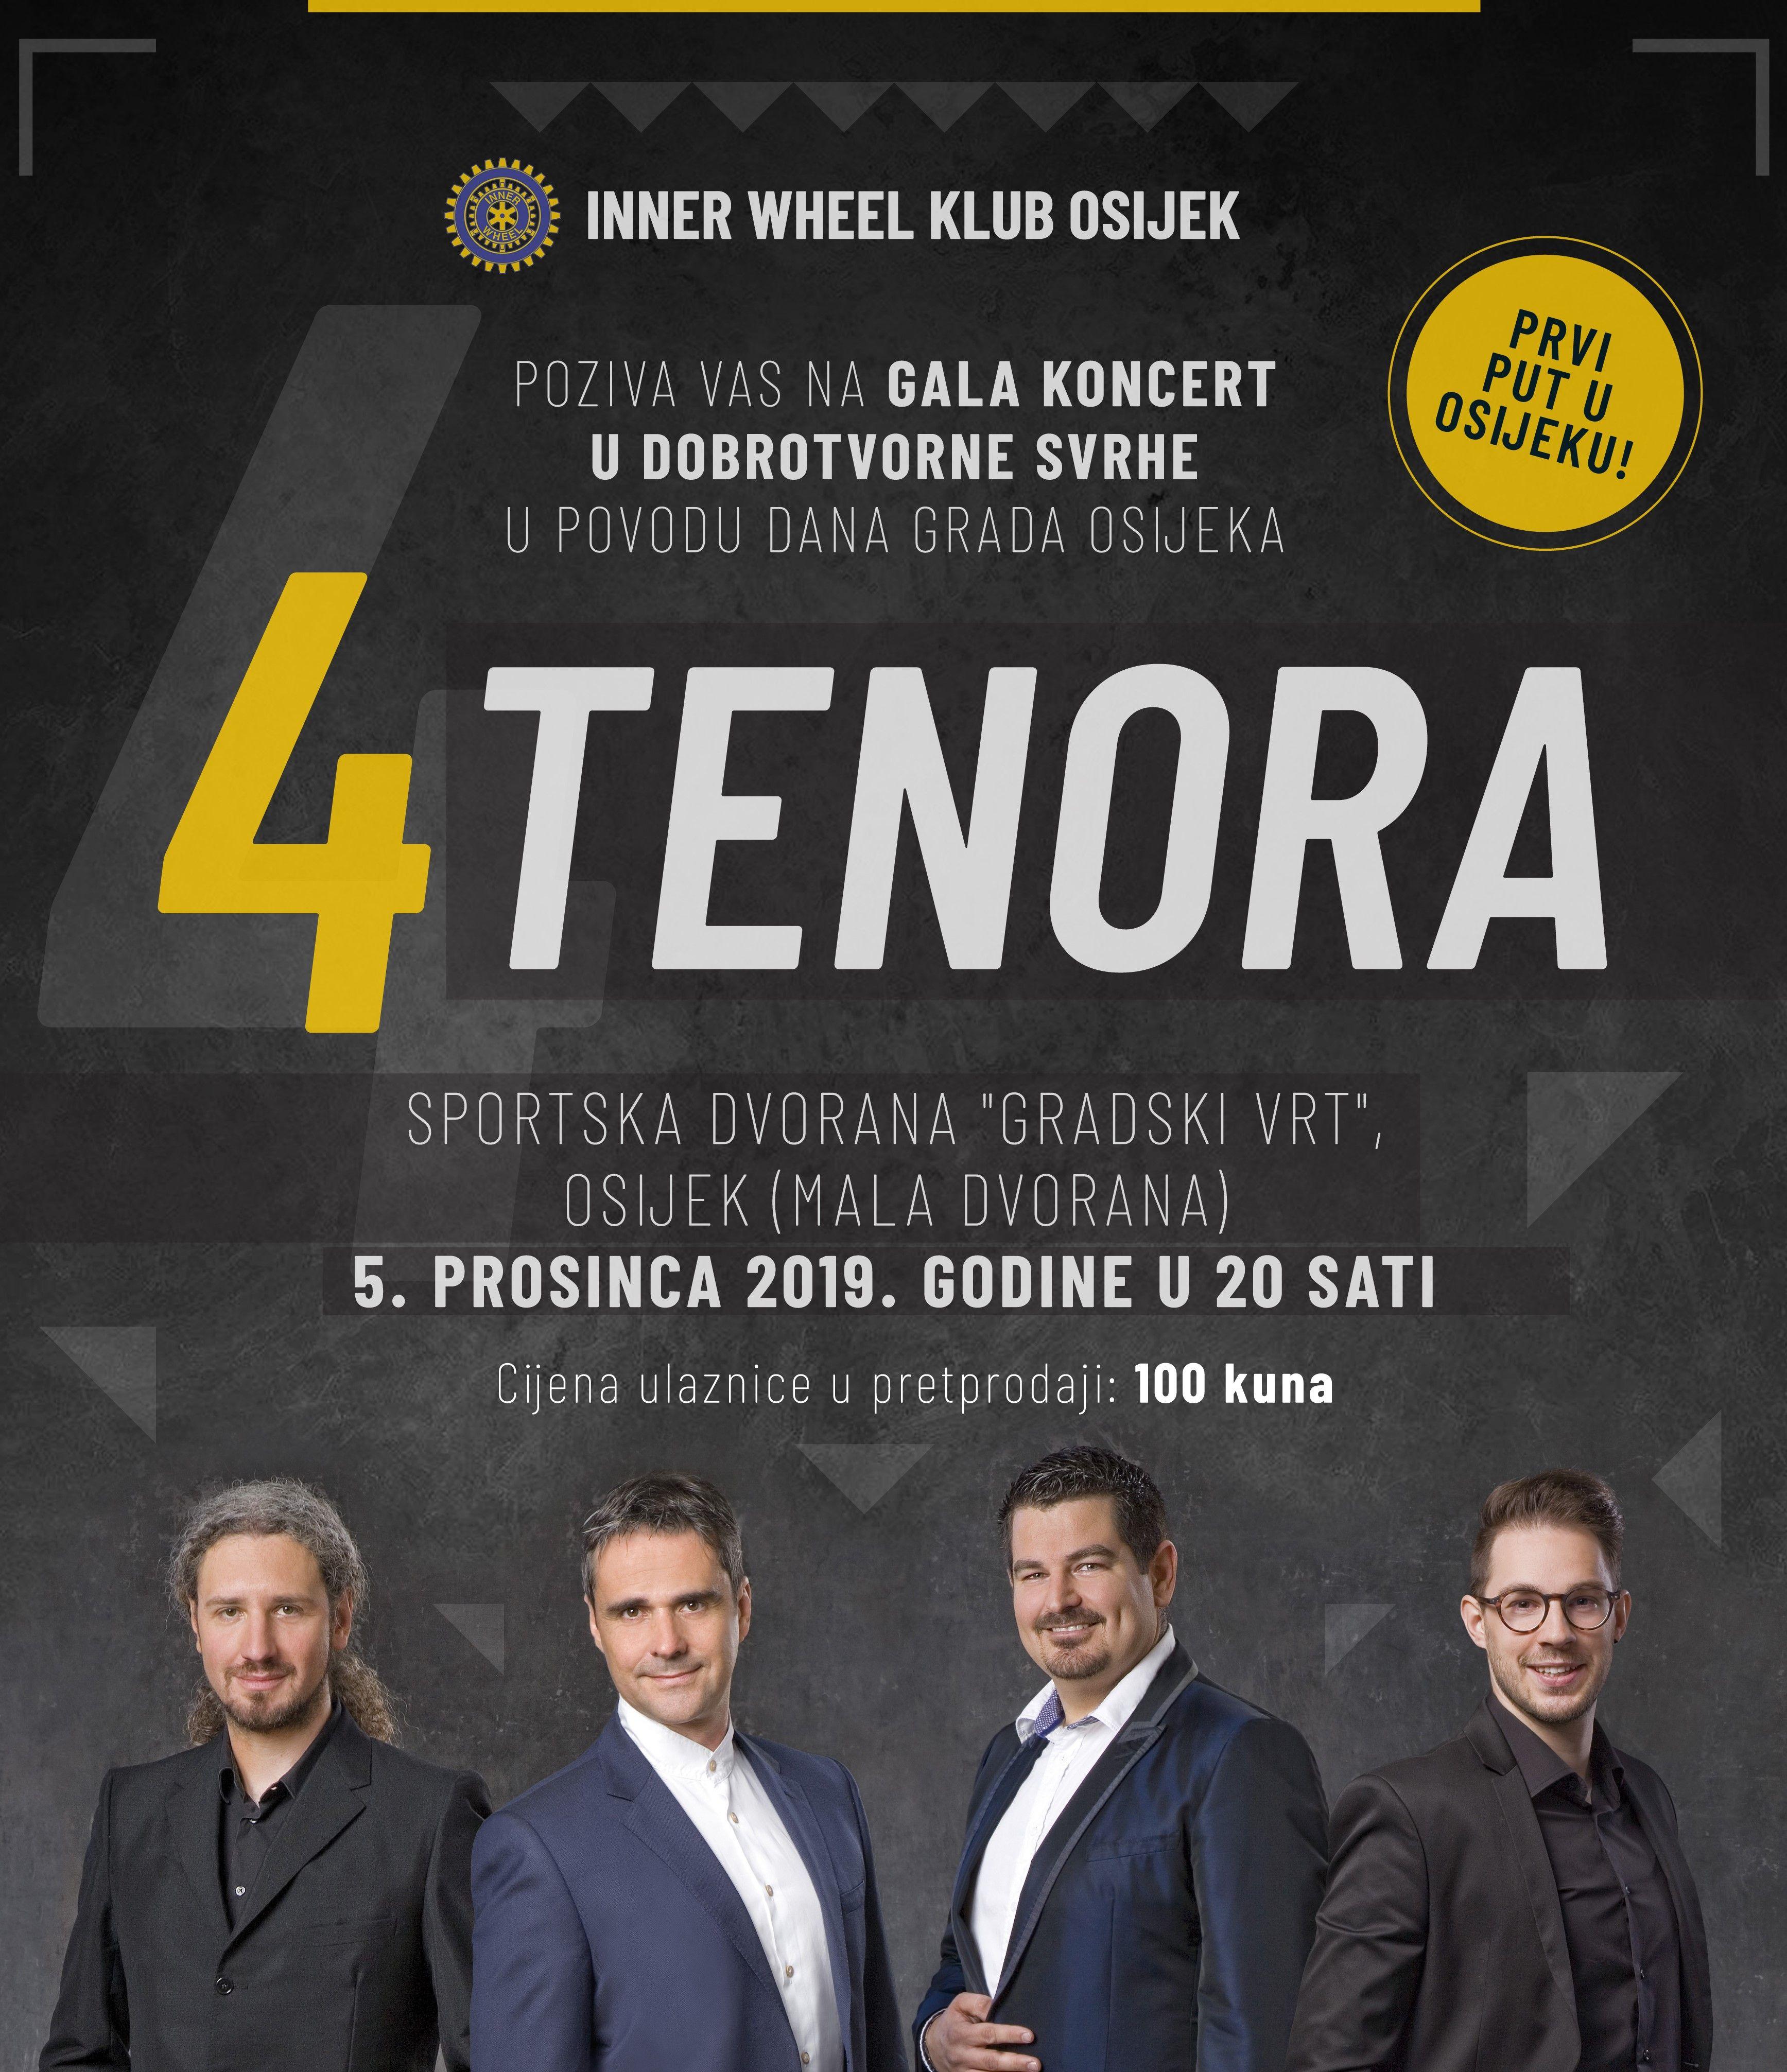 4 tenora gala koncert plaka tfinalni 151019